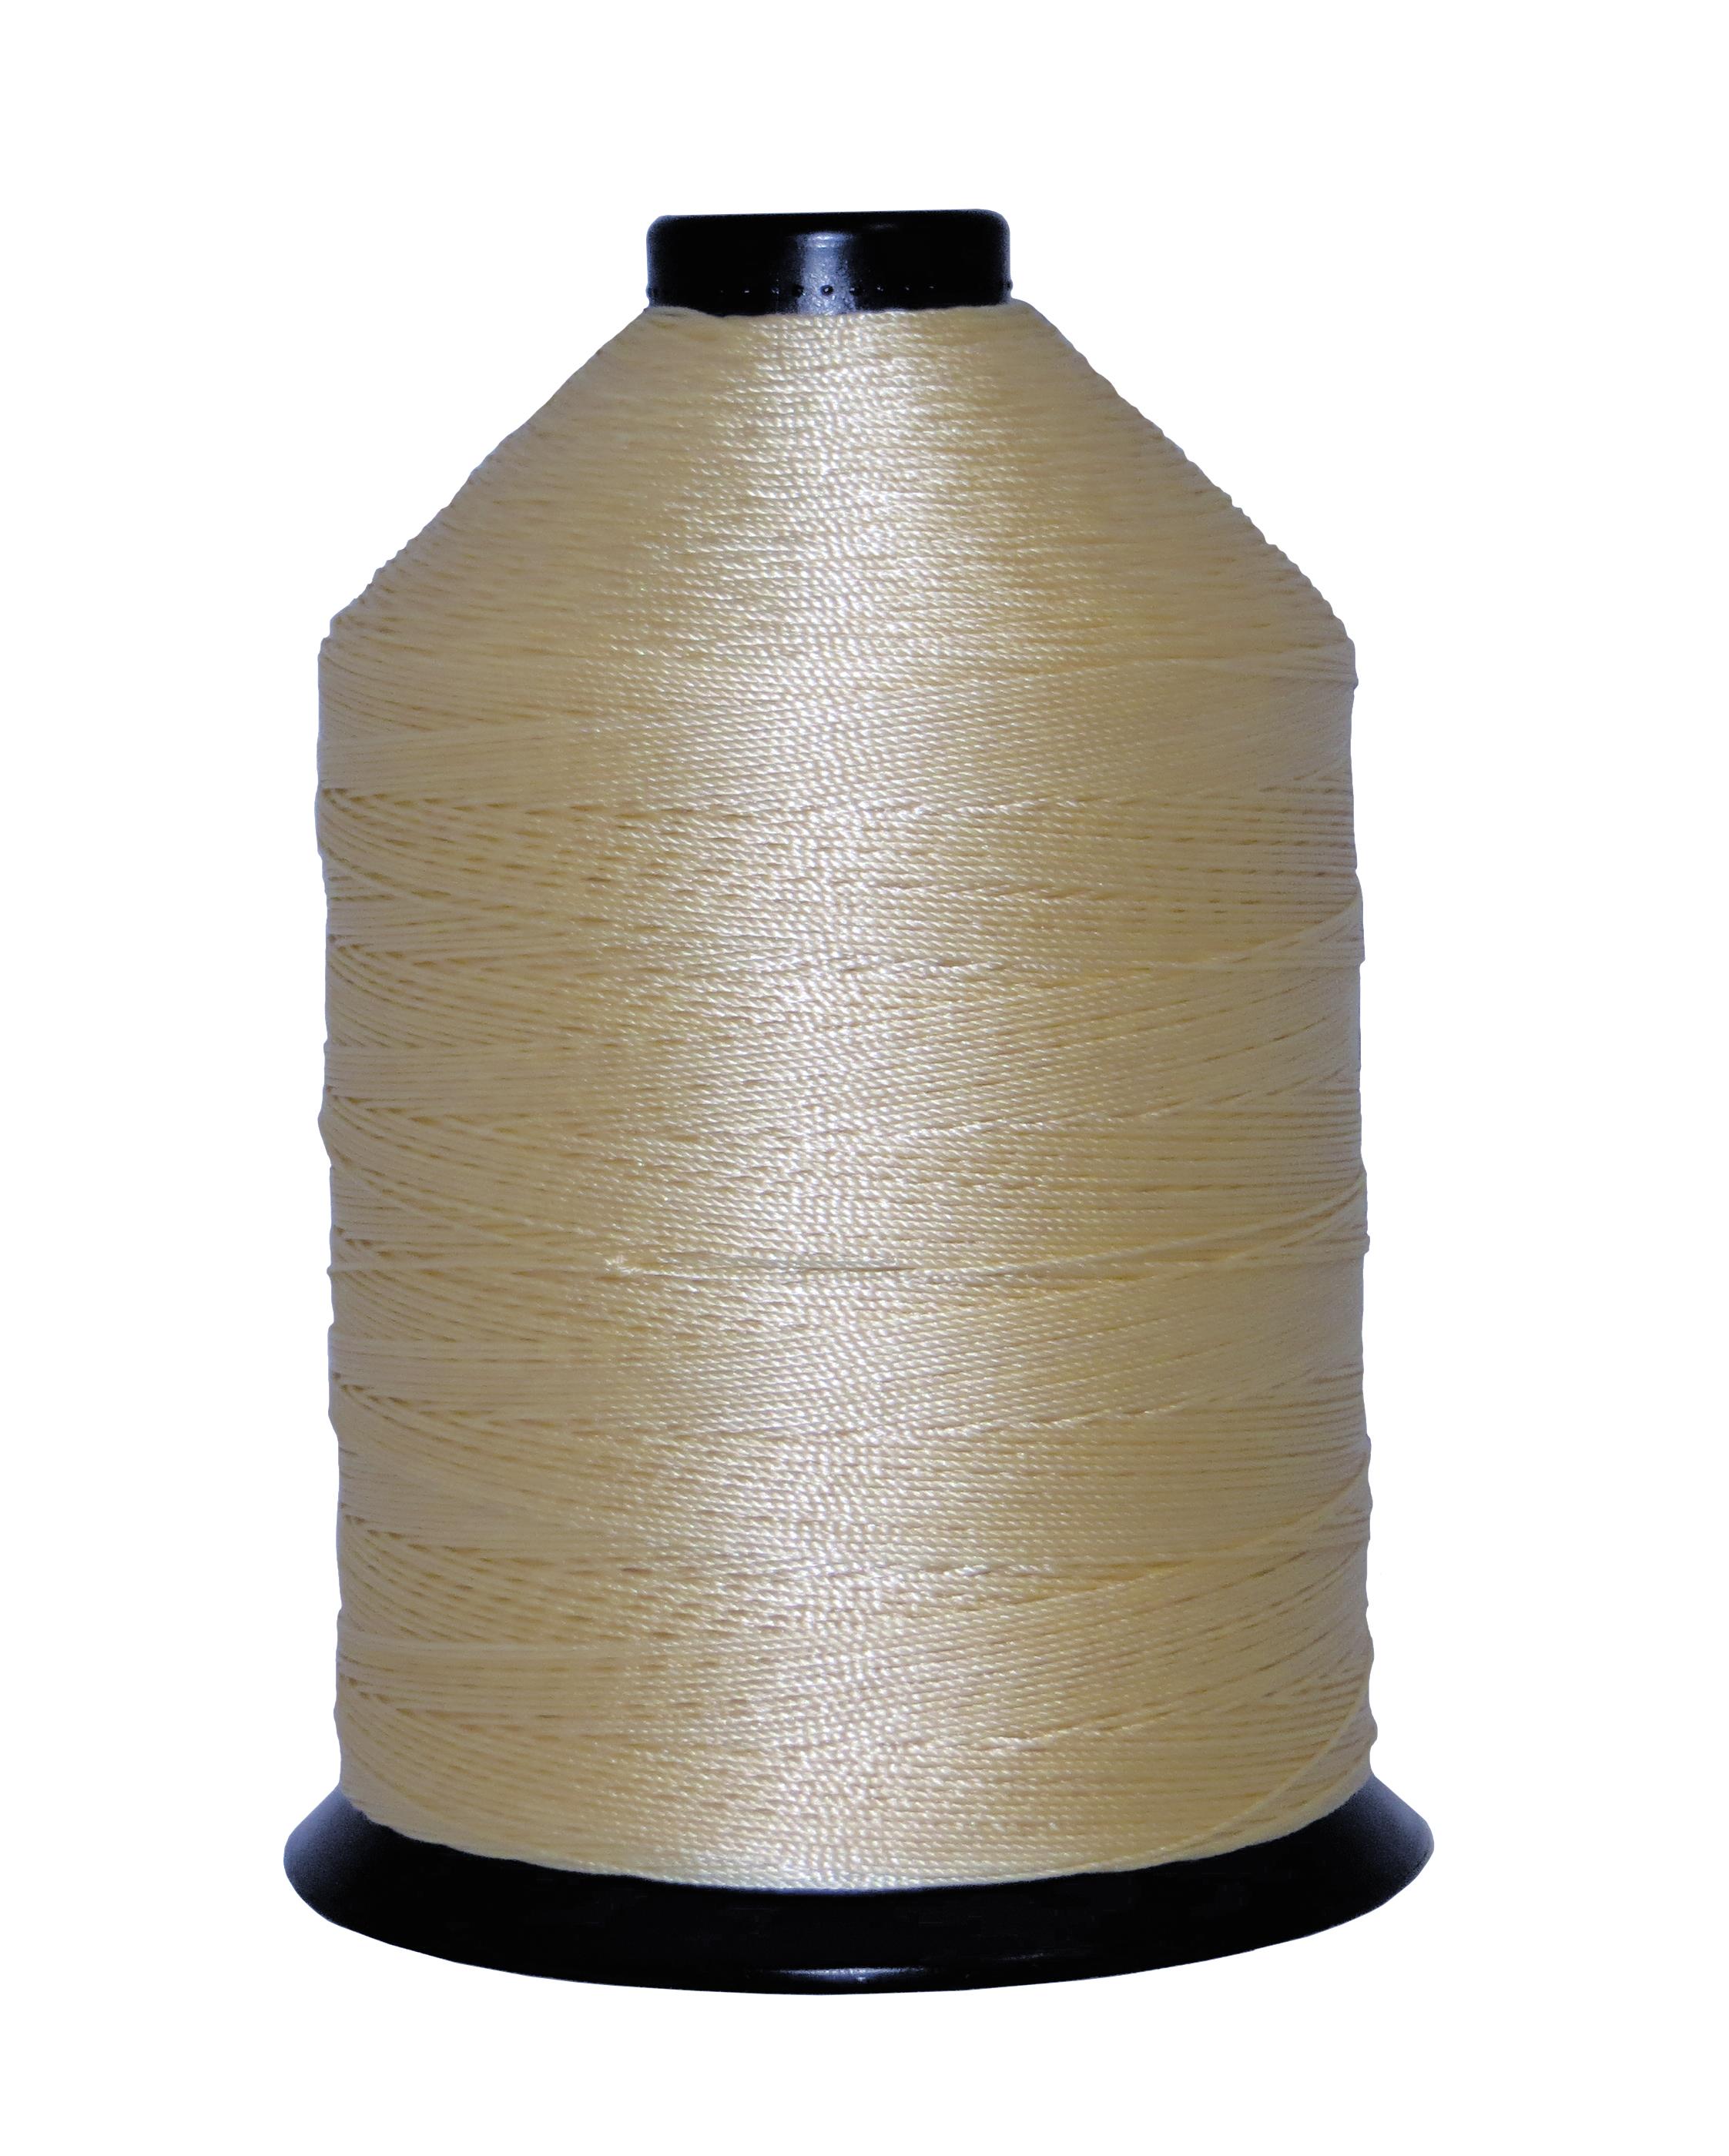 277 Bonded Nylon Machine Thread Lt2770